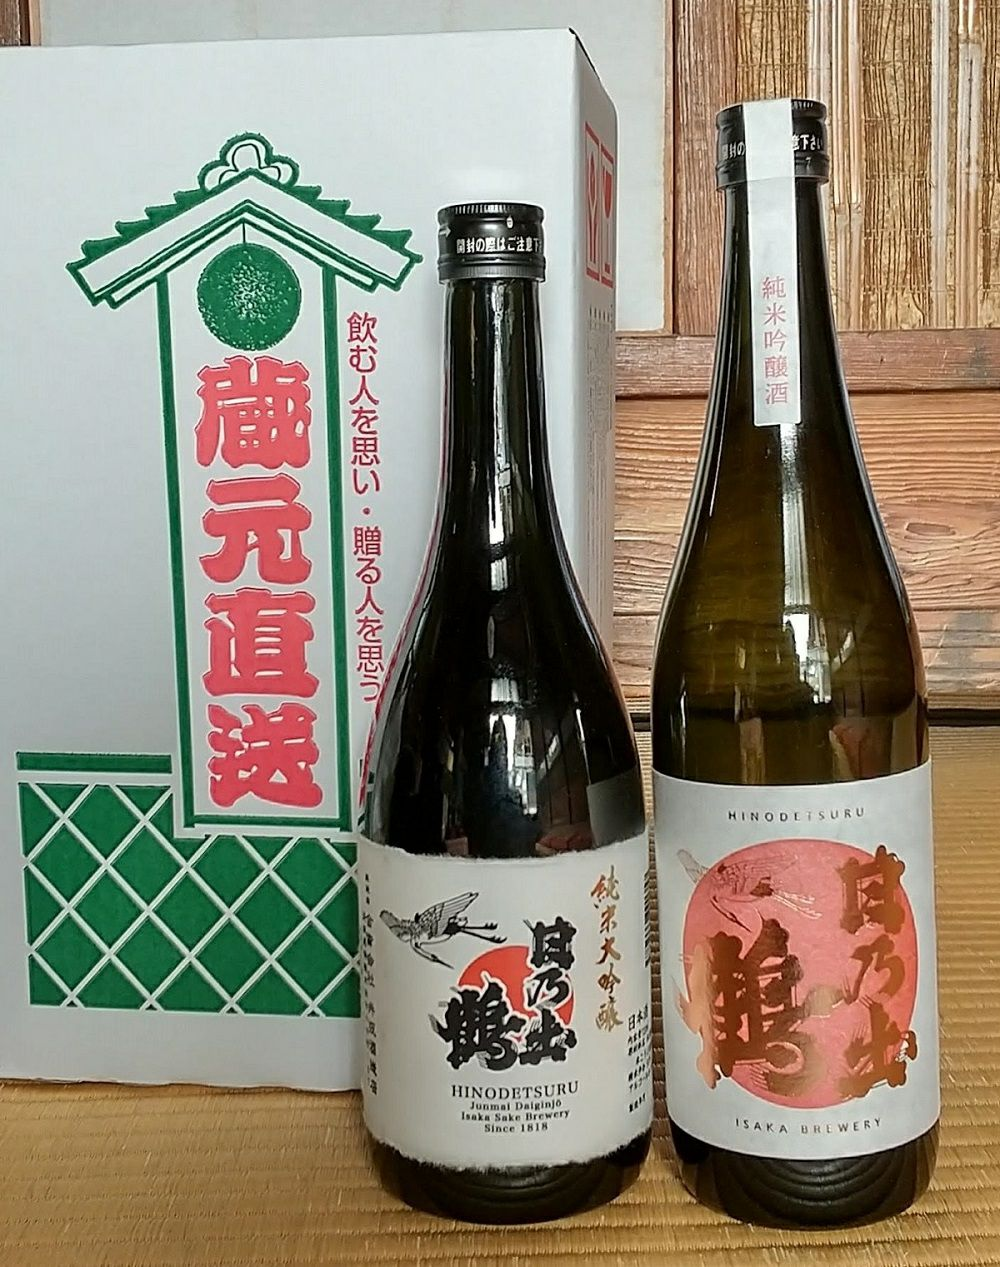 里美の地酒『日乃出鶴』純米大吟醸+純米吟醸2本セット